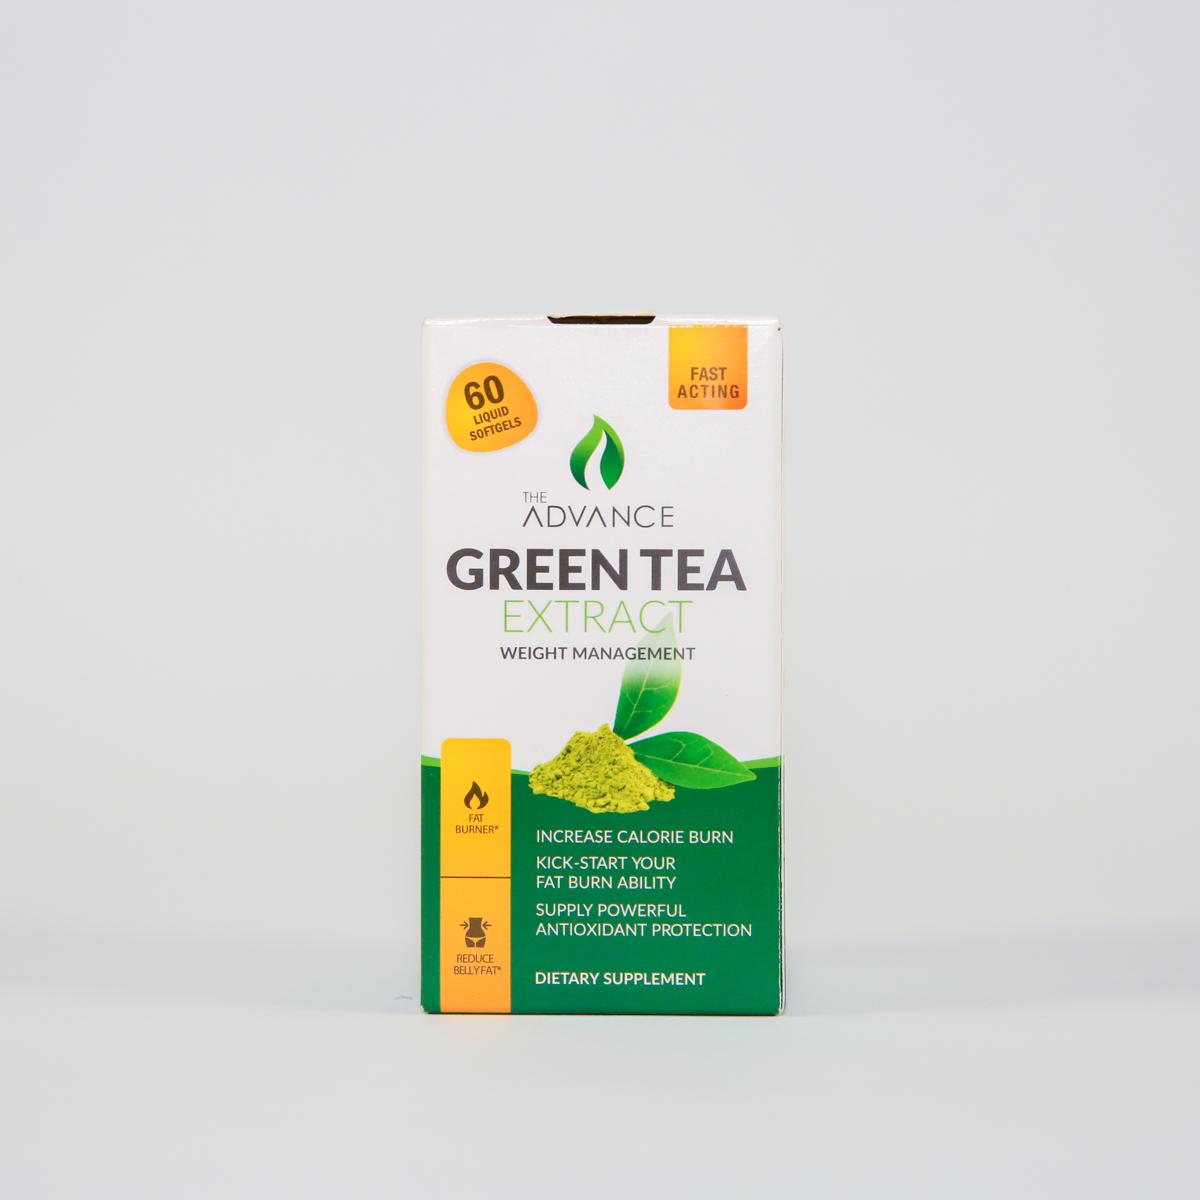 GREEN TEA EXTRACT WEIGHT MANAGEMENT